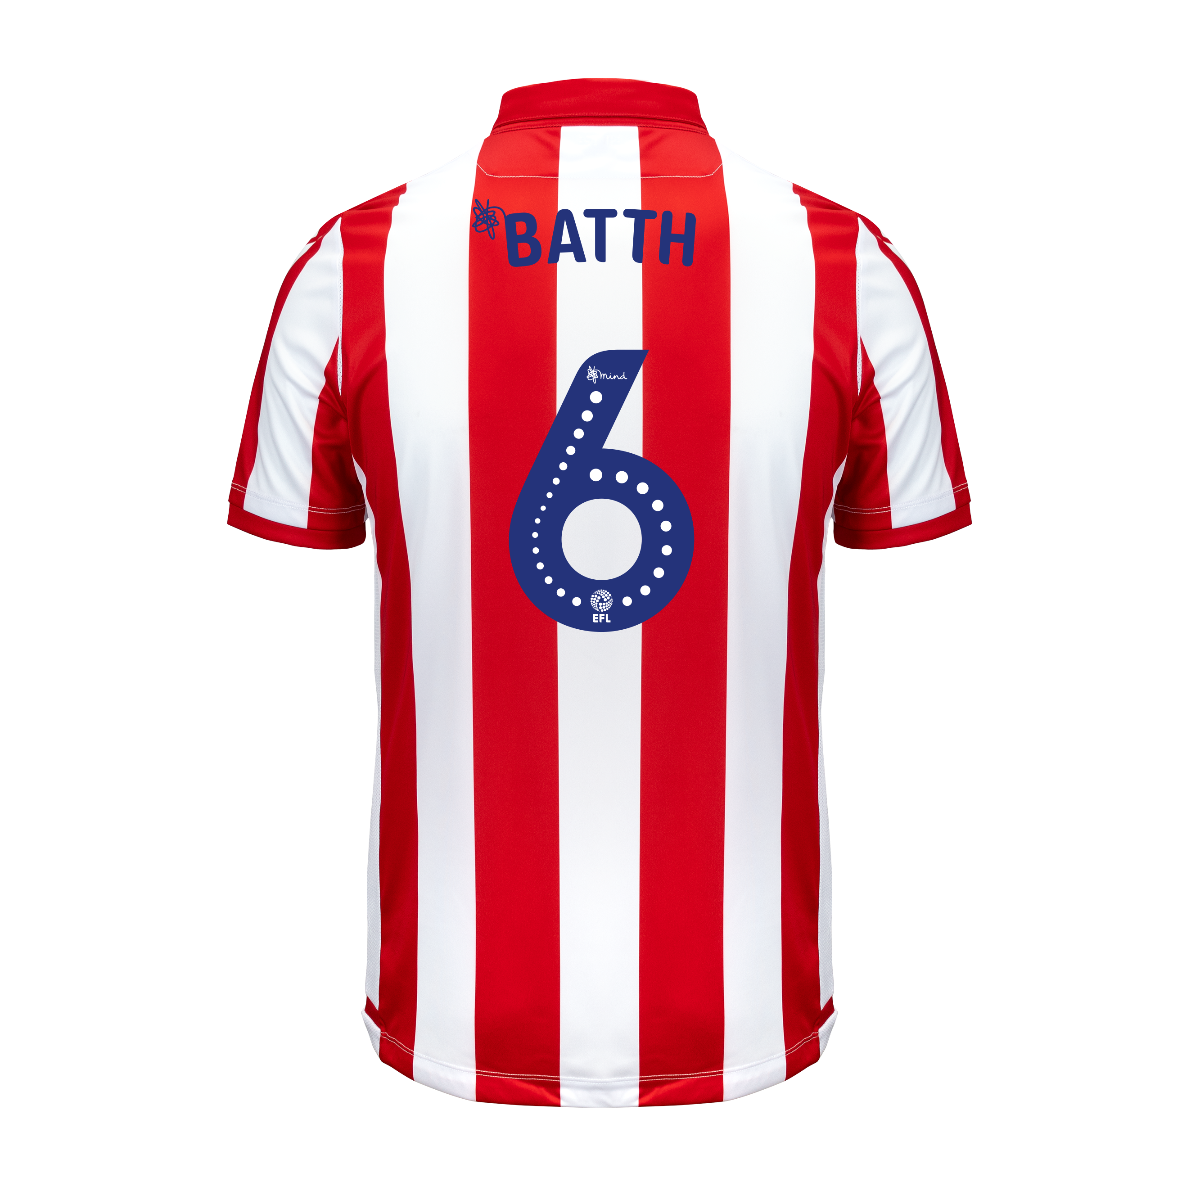 2019/20 Ladies Home Shirt - Batth